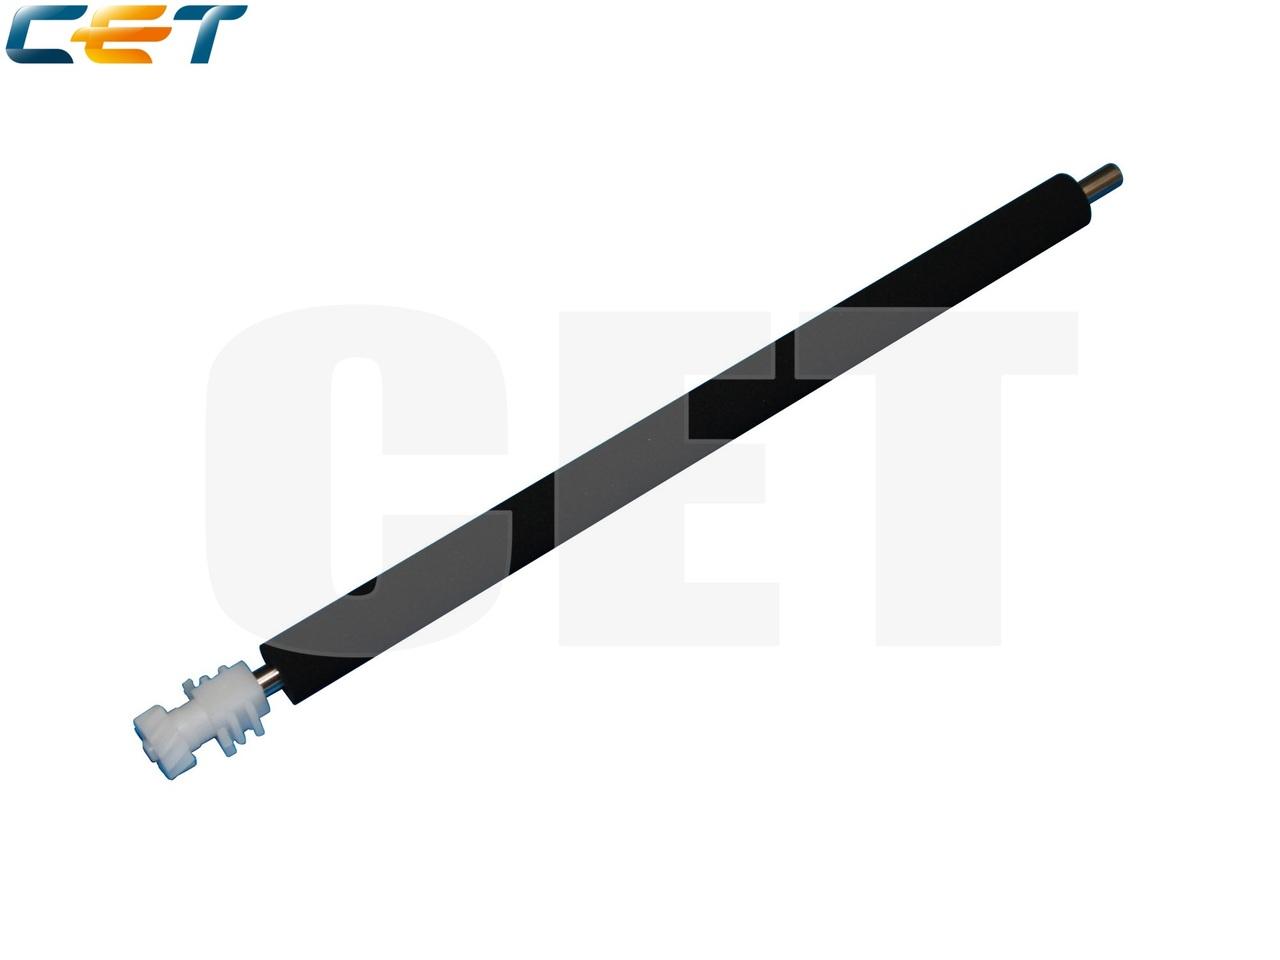 Ролик переноса с шестерней RM1-1508-000 для HP LaserJet2420/P3015/P3005, M521/M525 (CET), CET0352